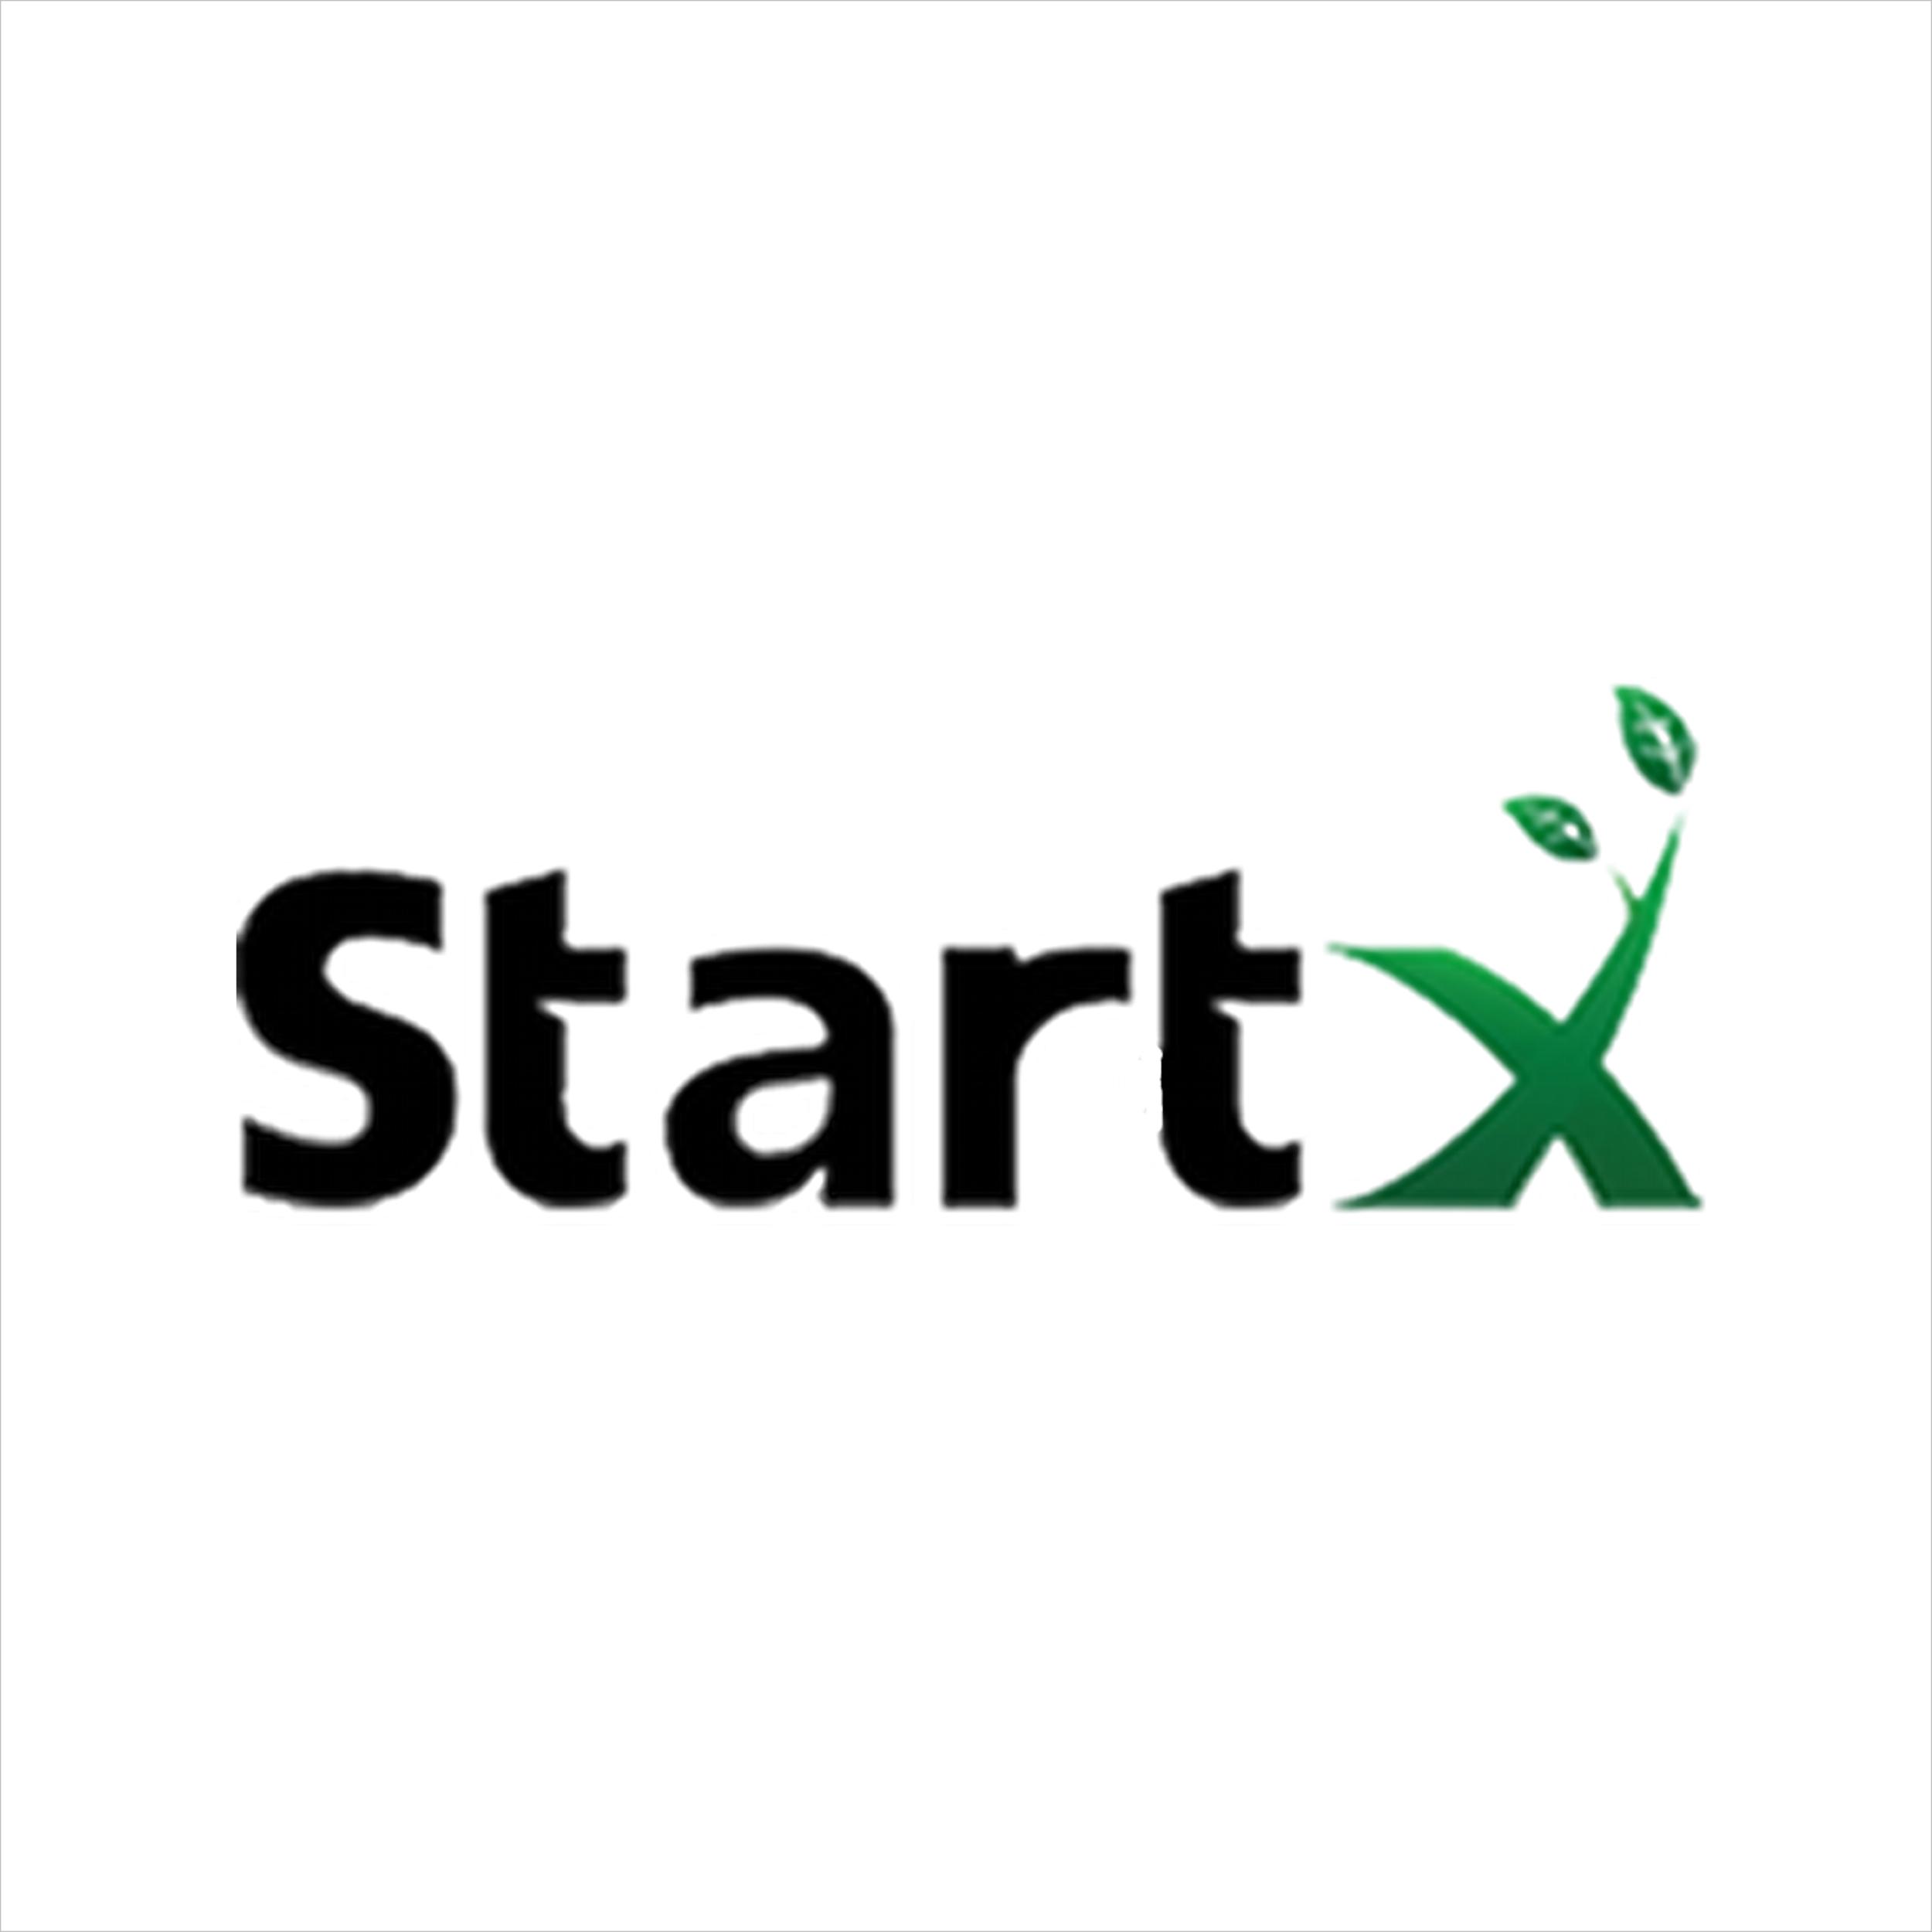 StartX.png